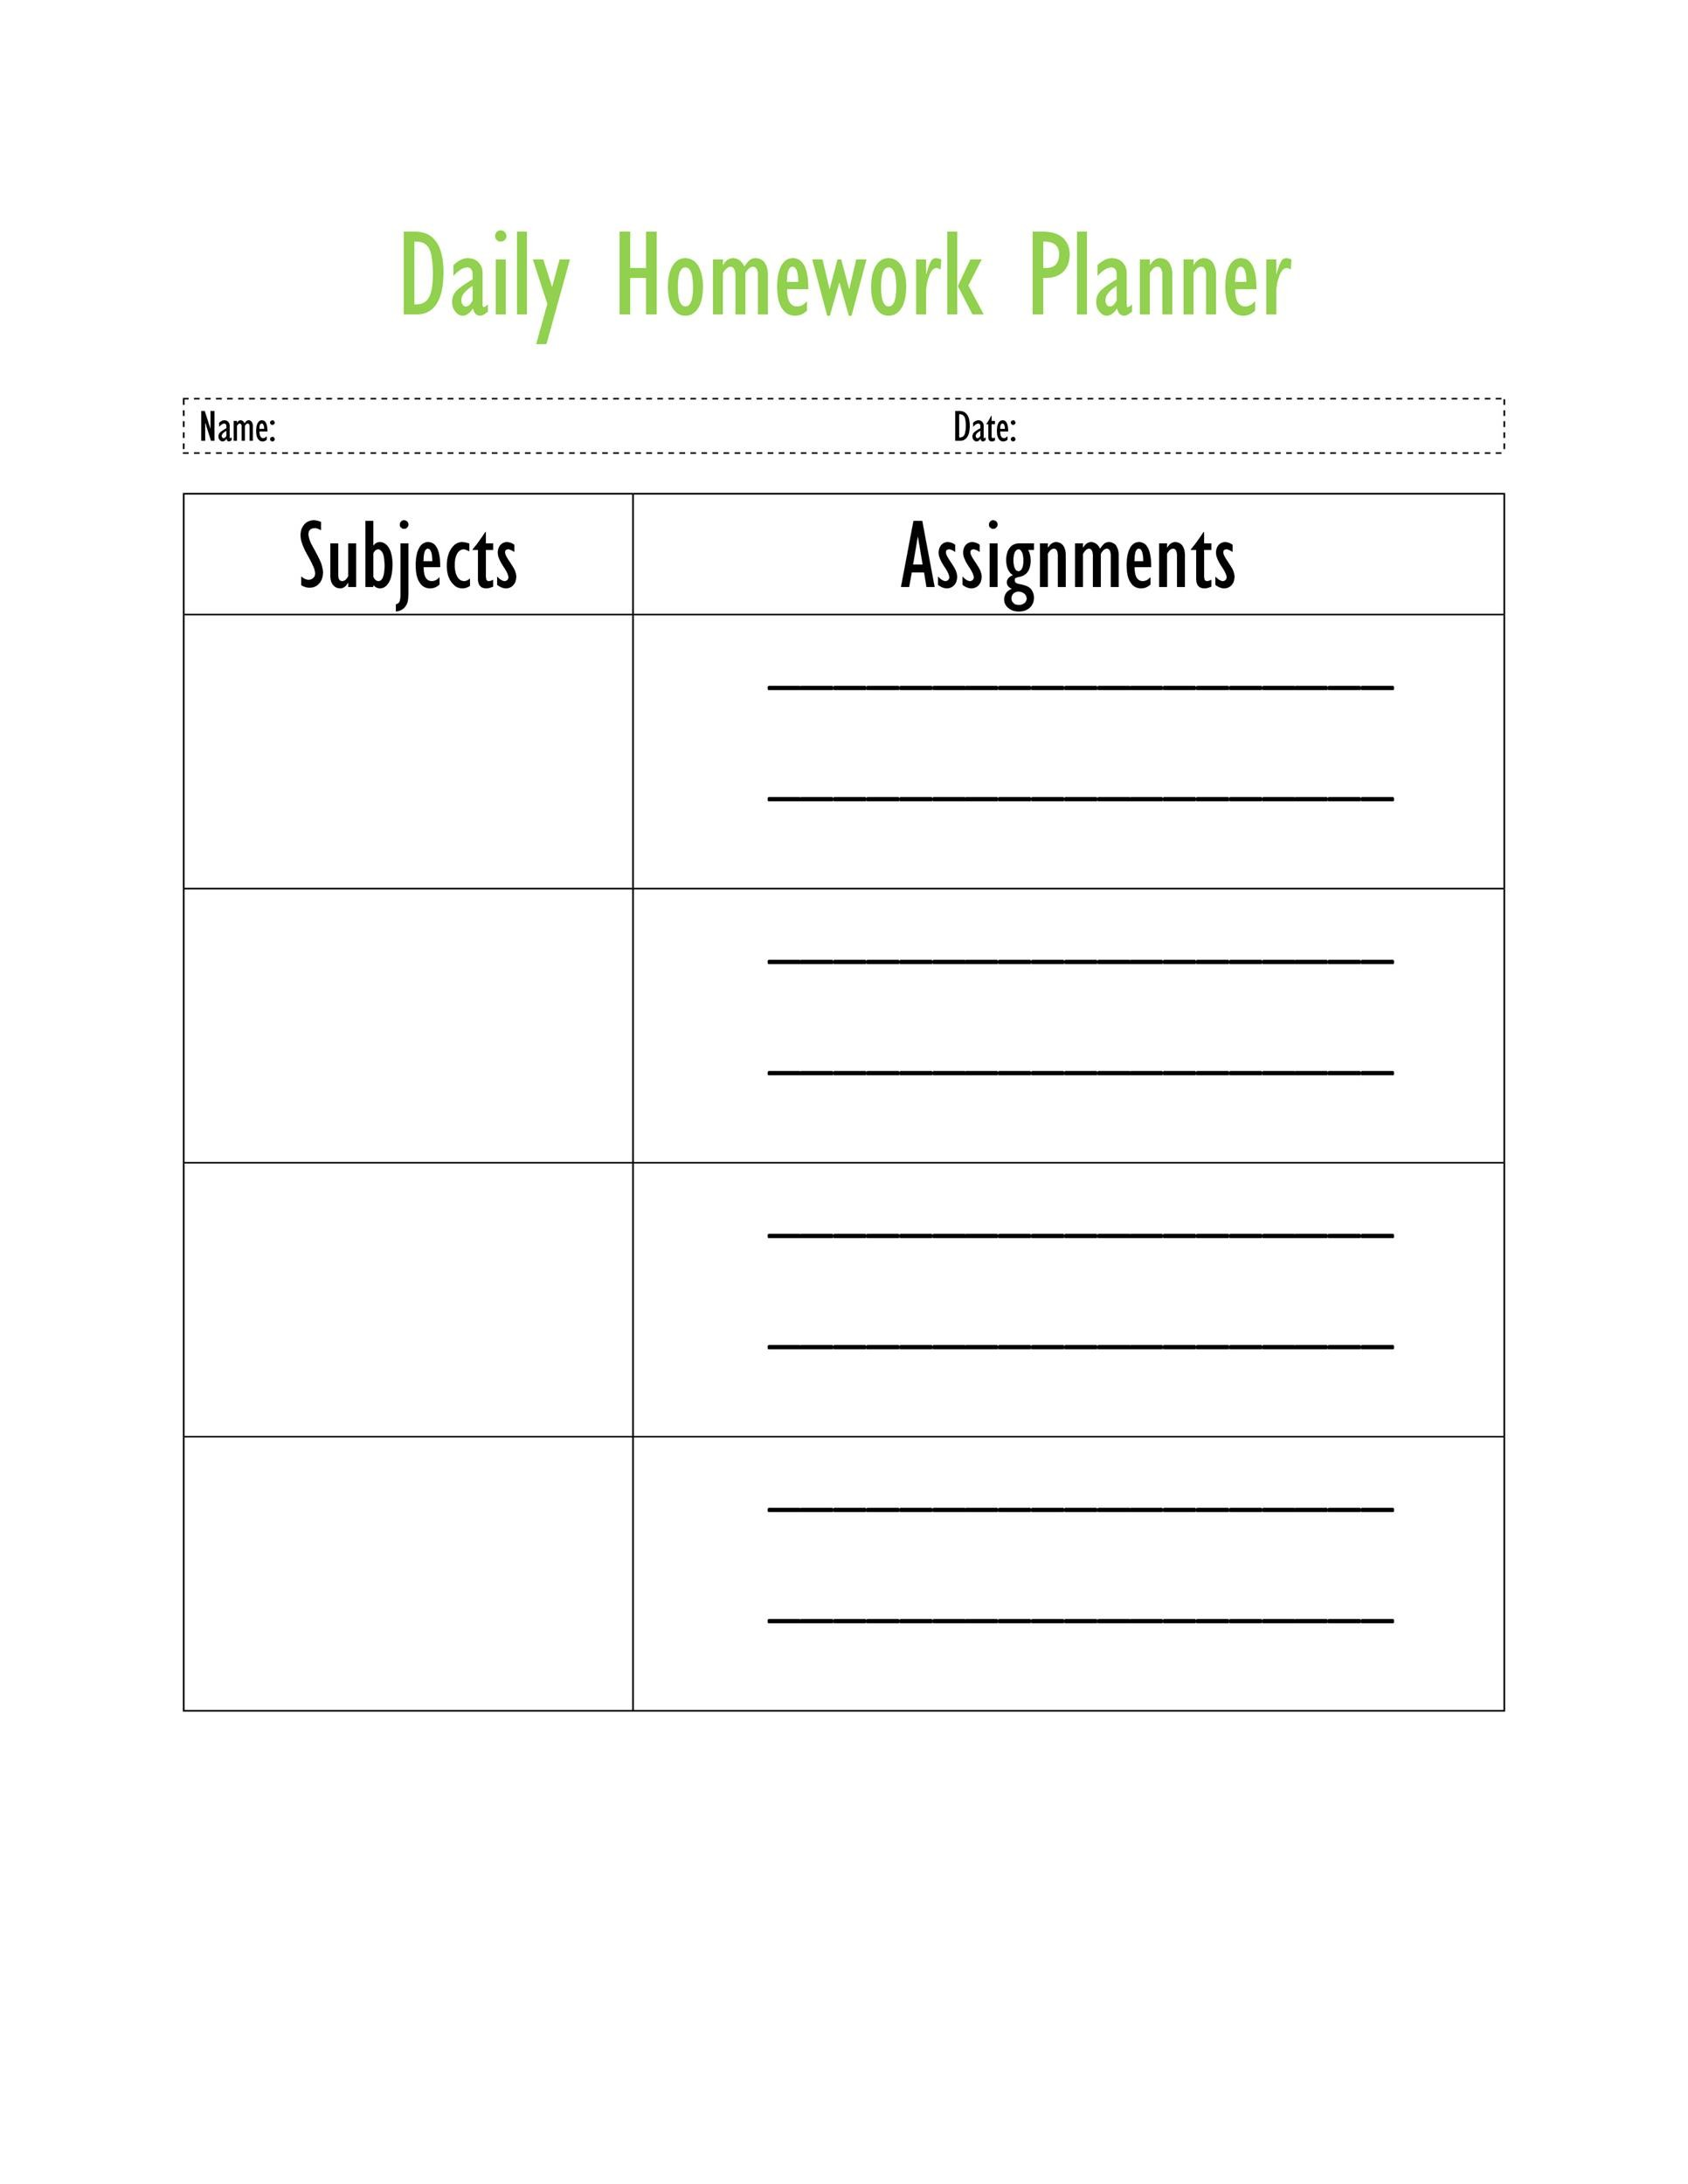 Free homework planner 16